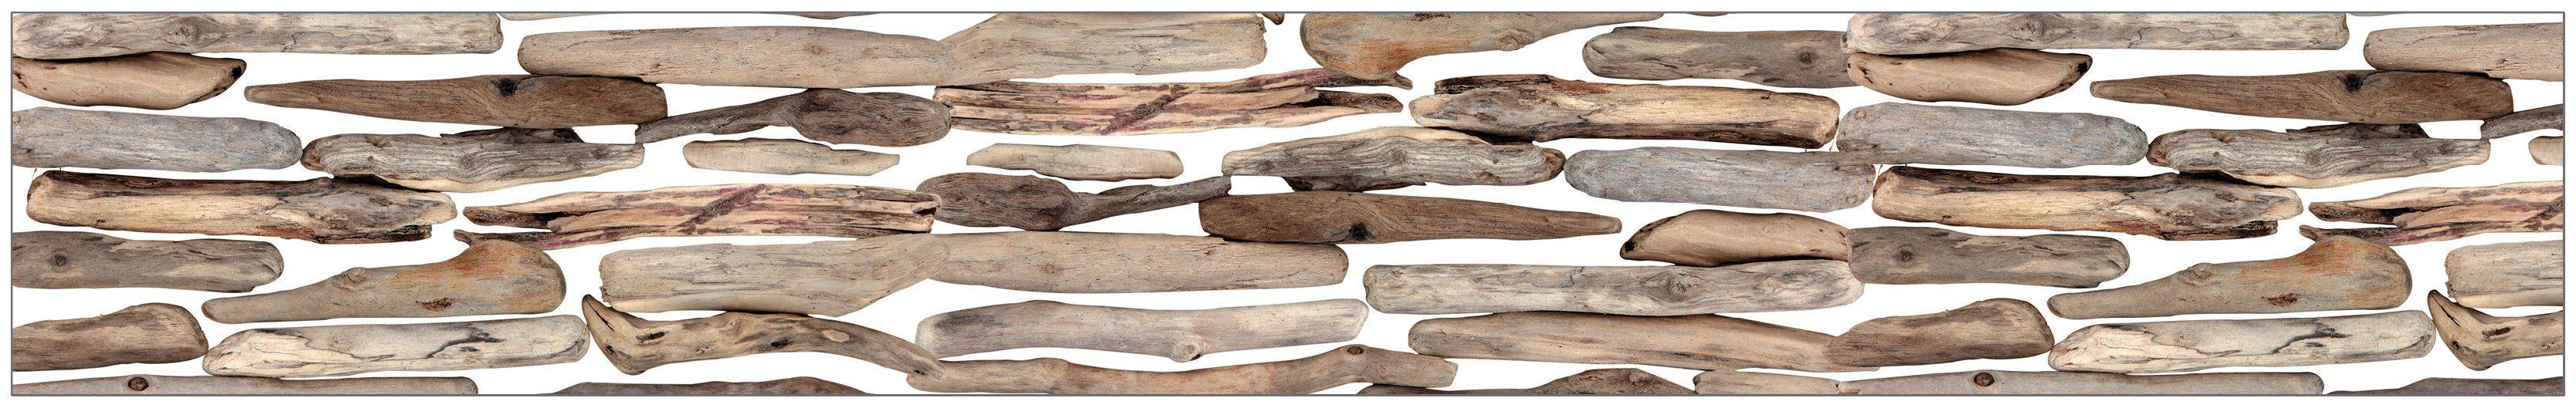 MYSPOTTI Fensterfolie »mySPOTTI look Driftwood«, 200 x 30 cm, statisch haftend